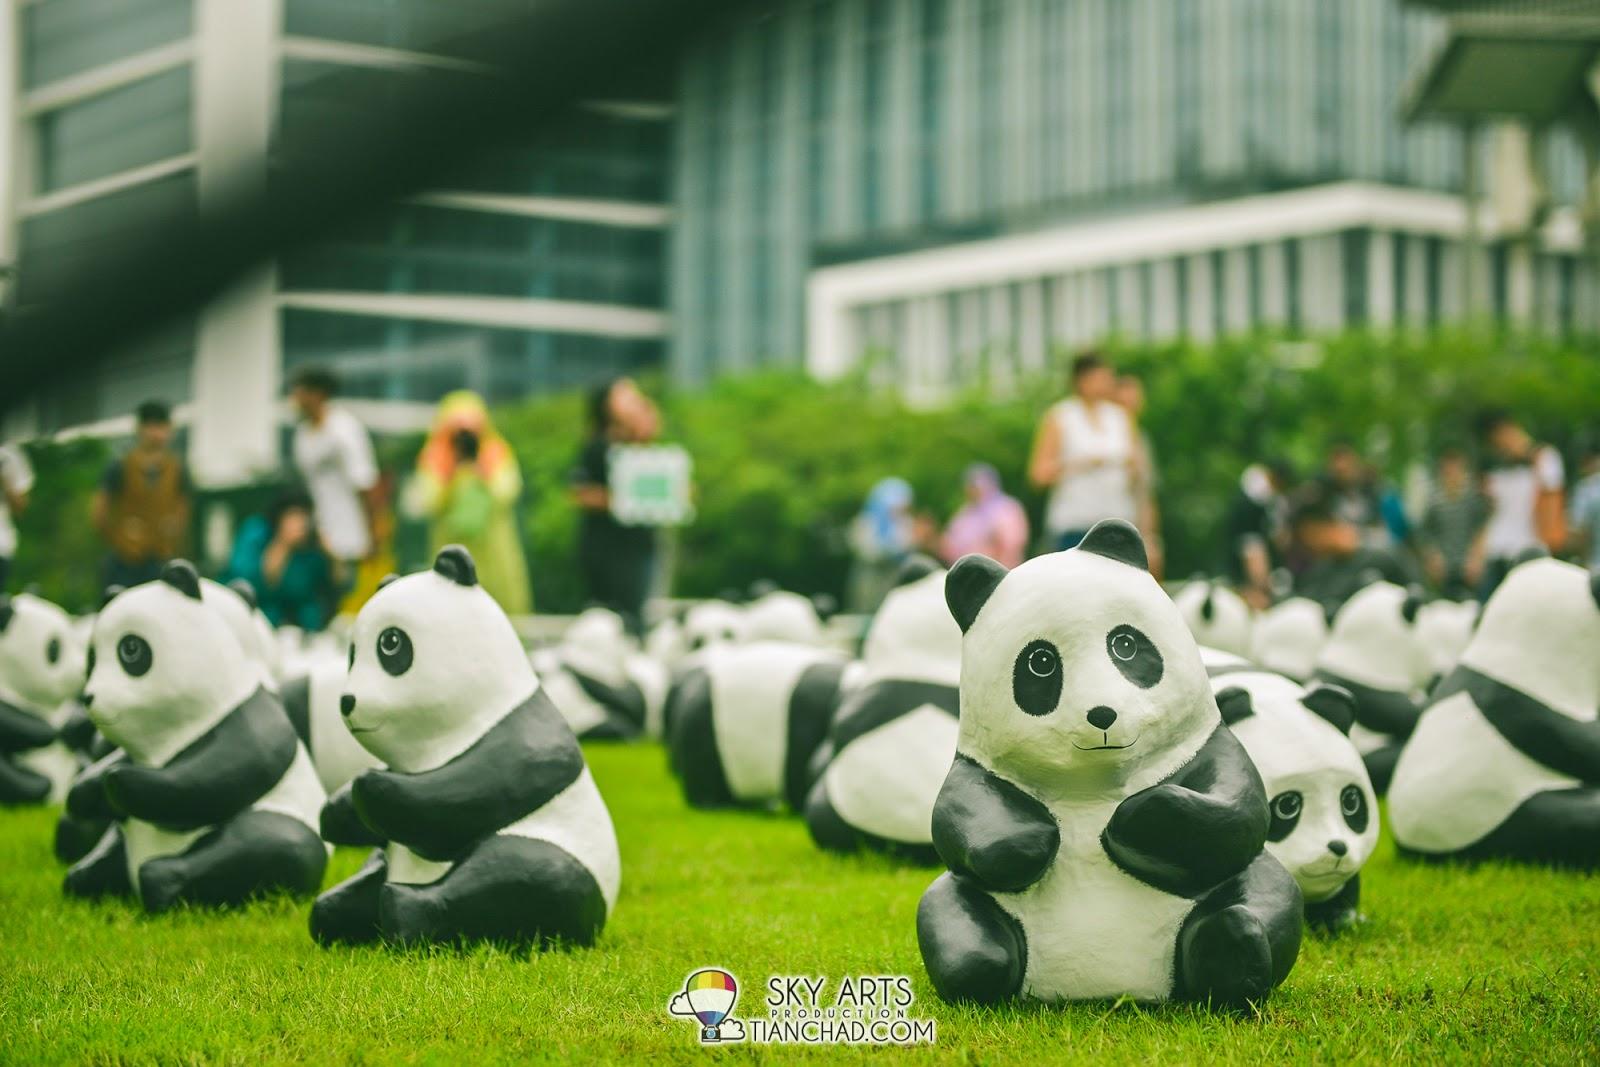 1600 Pandas Flash Mob @ Perbadanan Putrajaya, Malaysia #1600Pandas #1600PandasMY